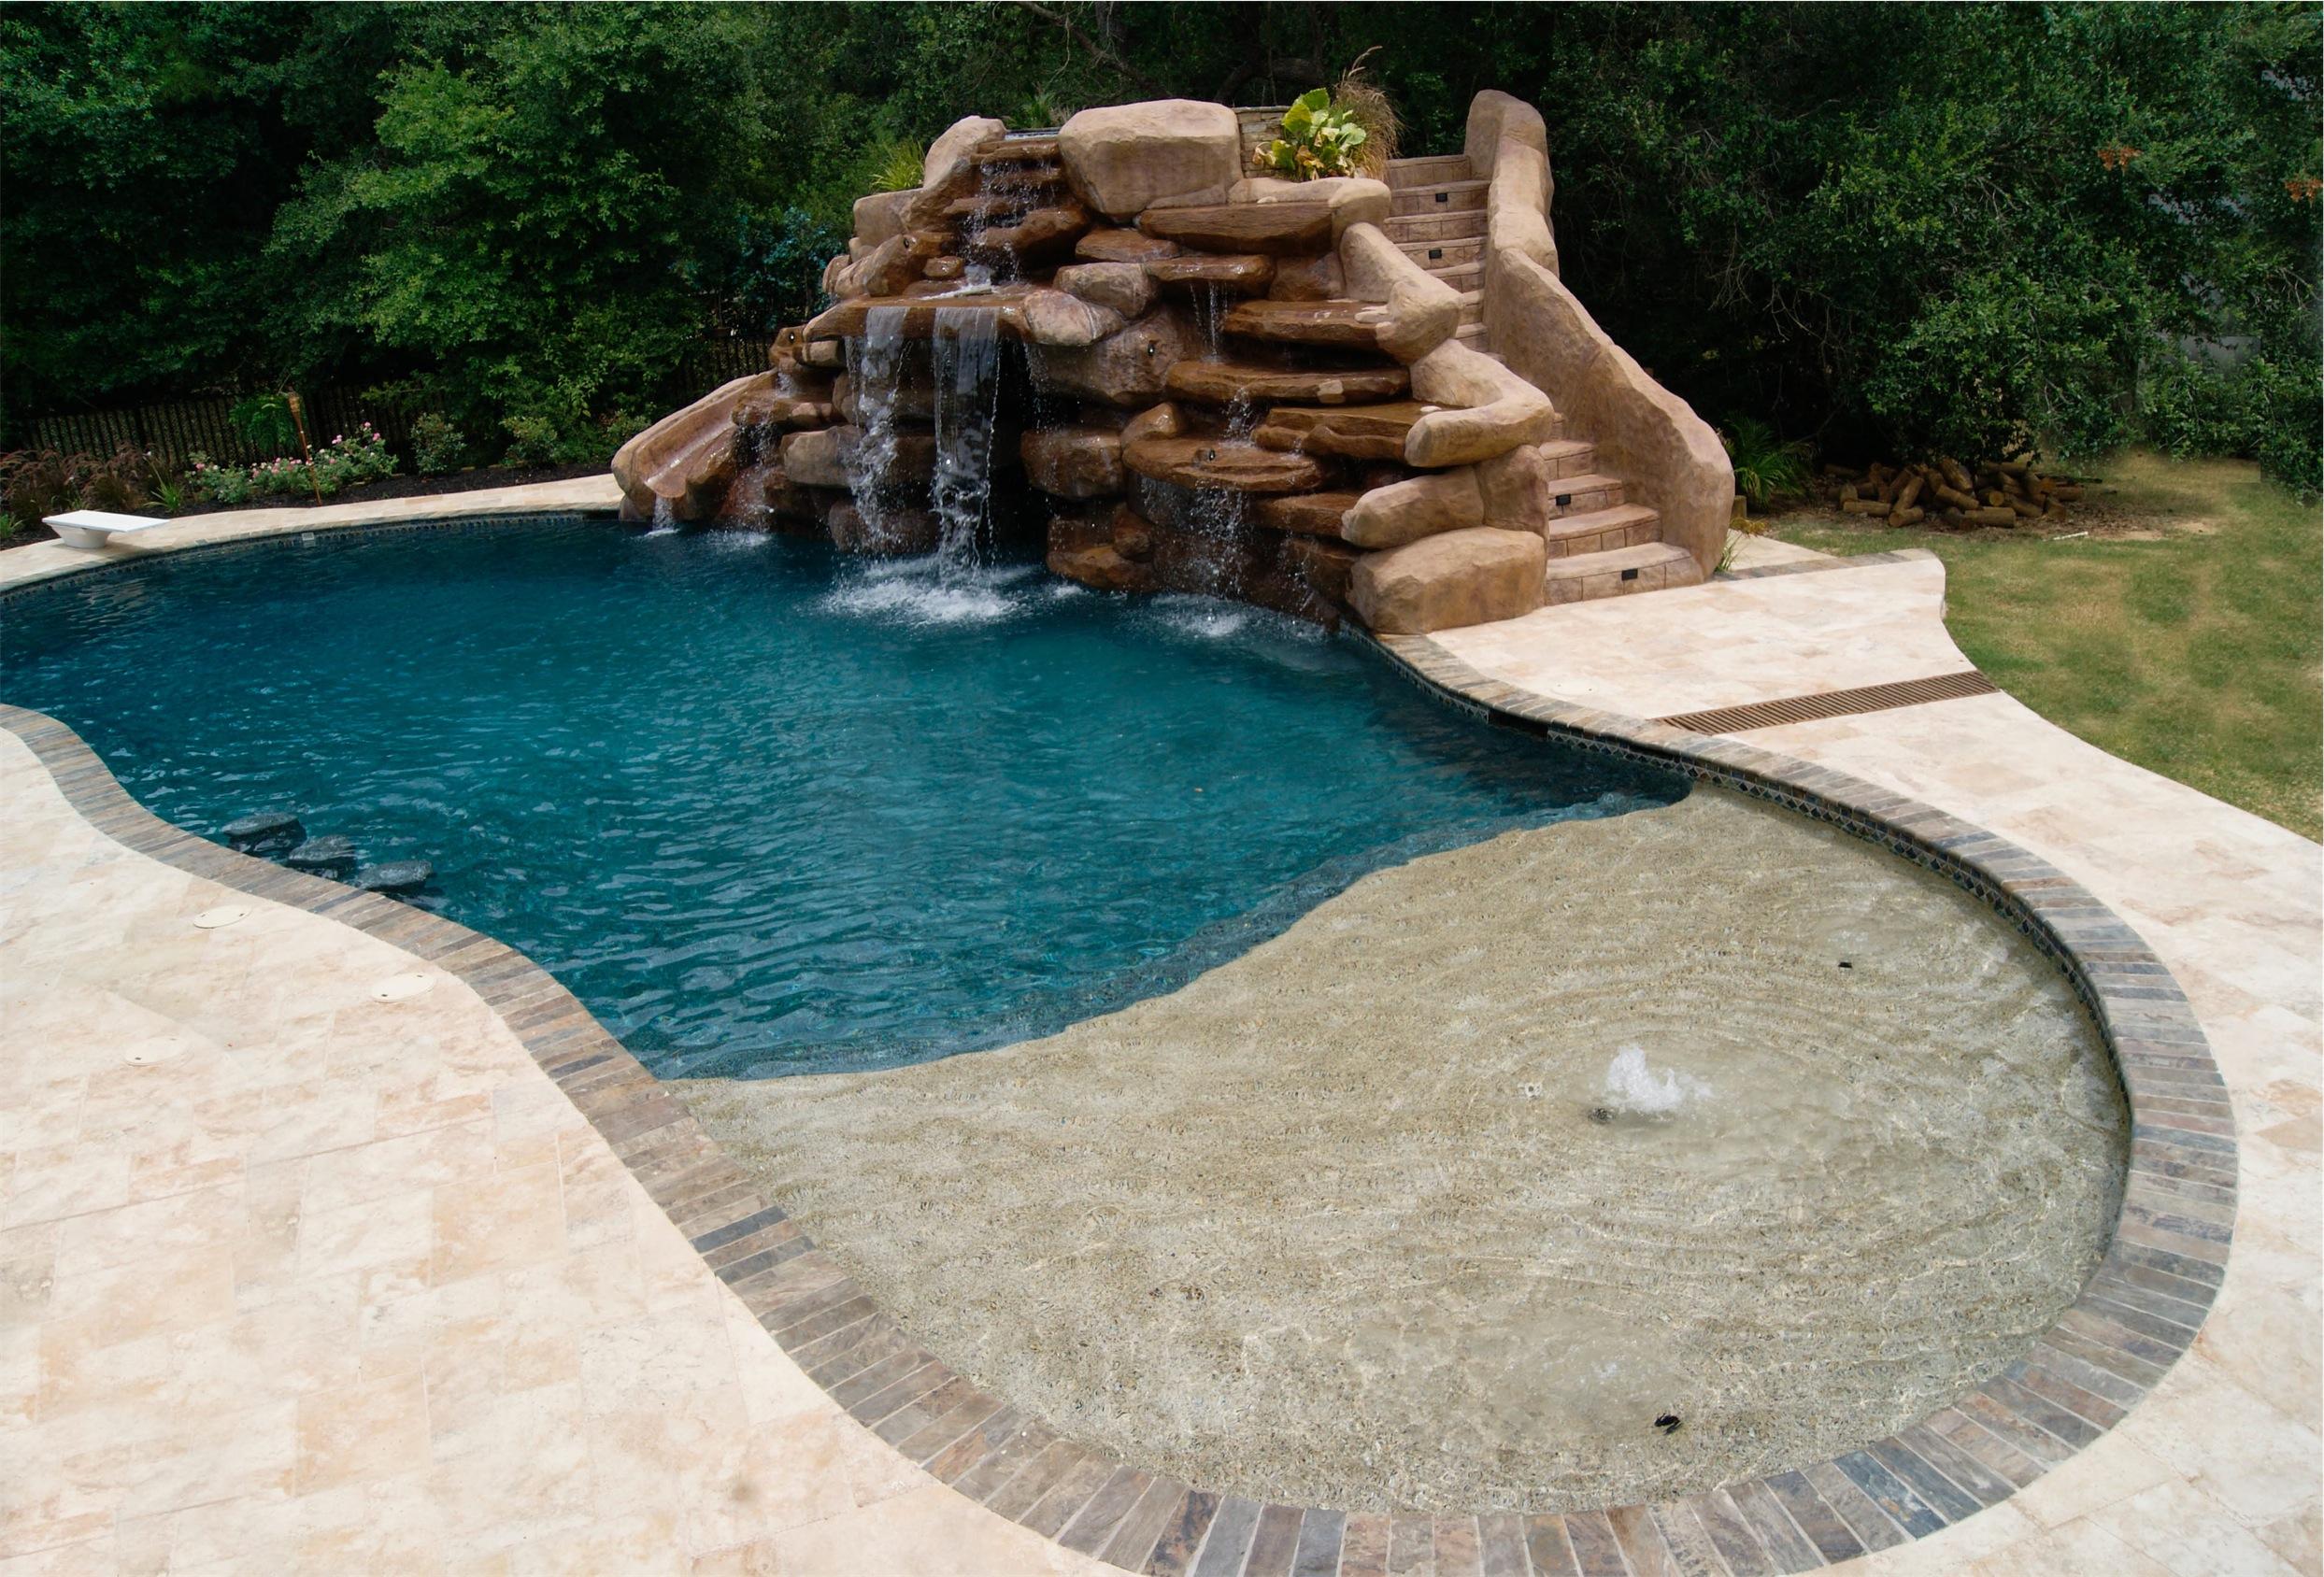 inground pool waterfalls. Custome Pool With Rocks Waterfall And Stairs Inground Waterfalls L